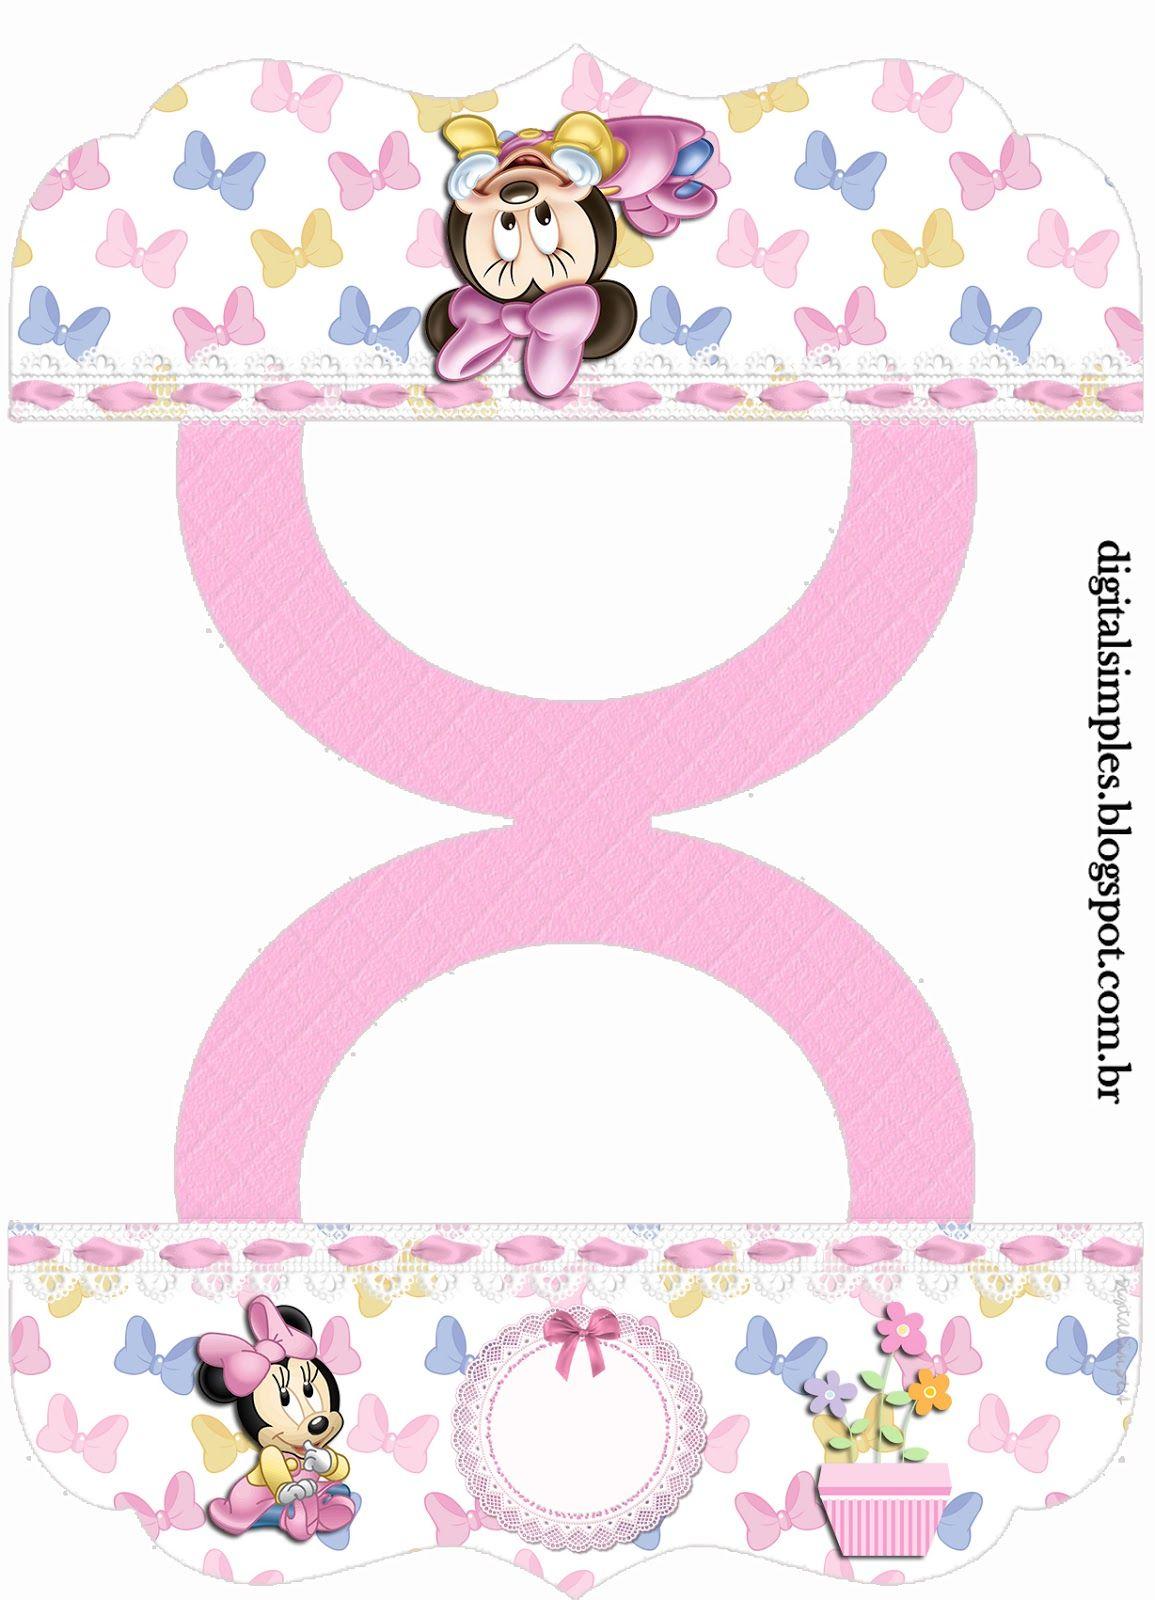 Kit de personalizados minnie mouse baby para imprimir - Candy candy diva futura ...